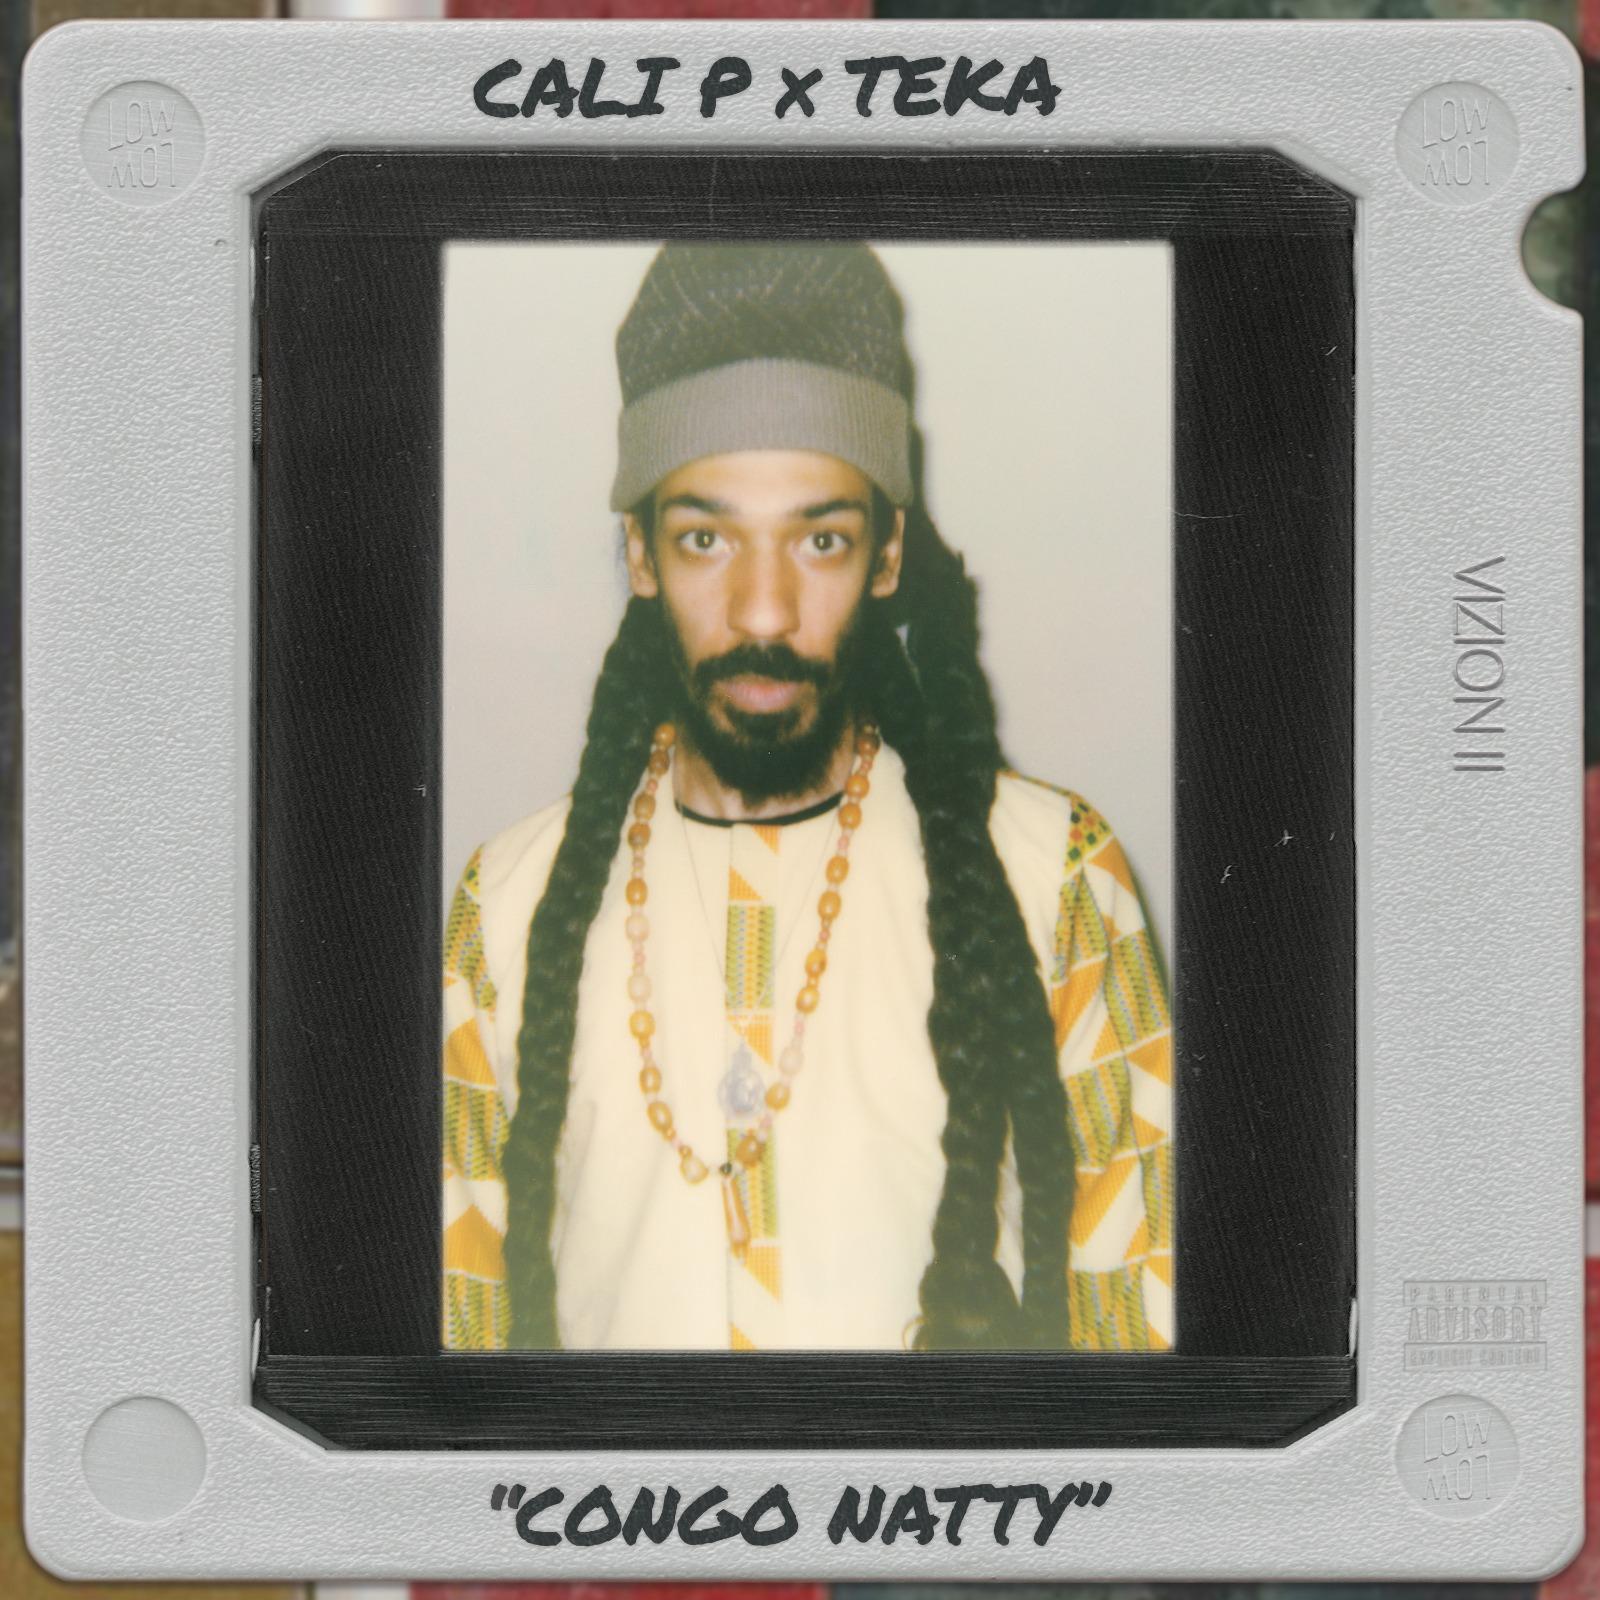 Cali P x Teka – Congo Natty